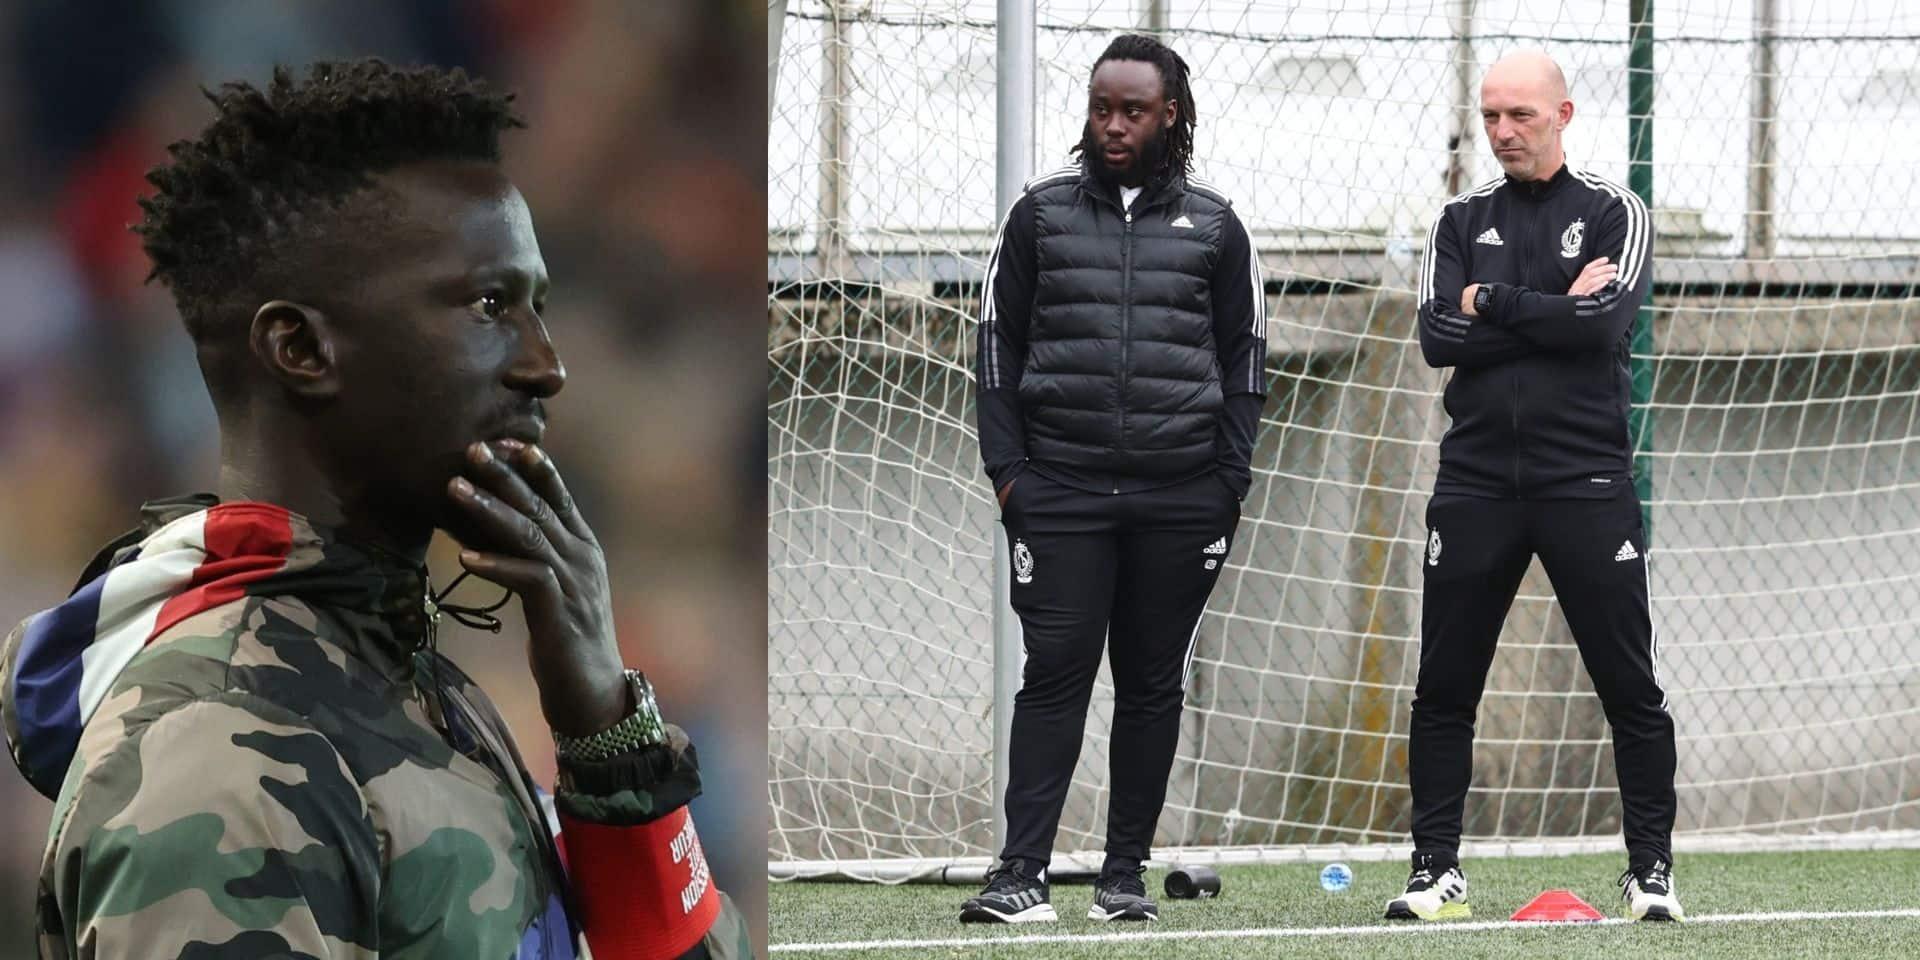 Officiel: Mbaye Leye n'est plus l'entraîneur du Standard, Valenne, Caprasse et Goreux assurent l'intérim